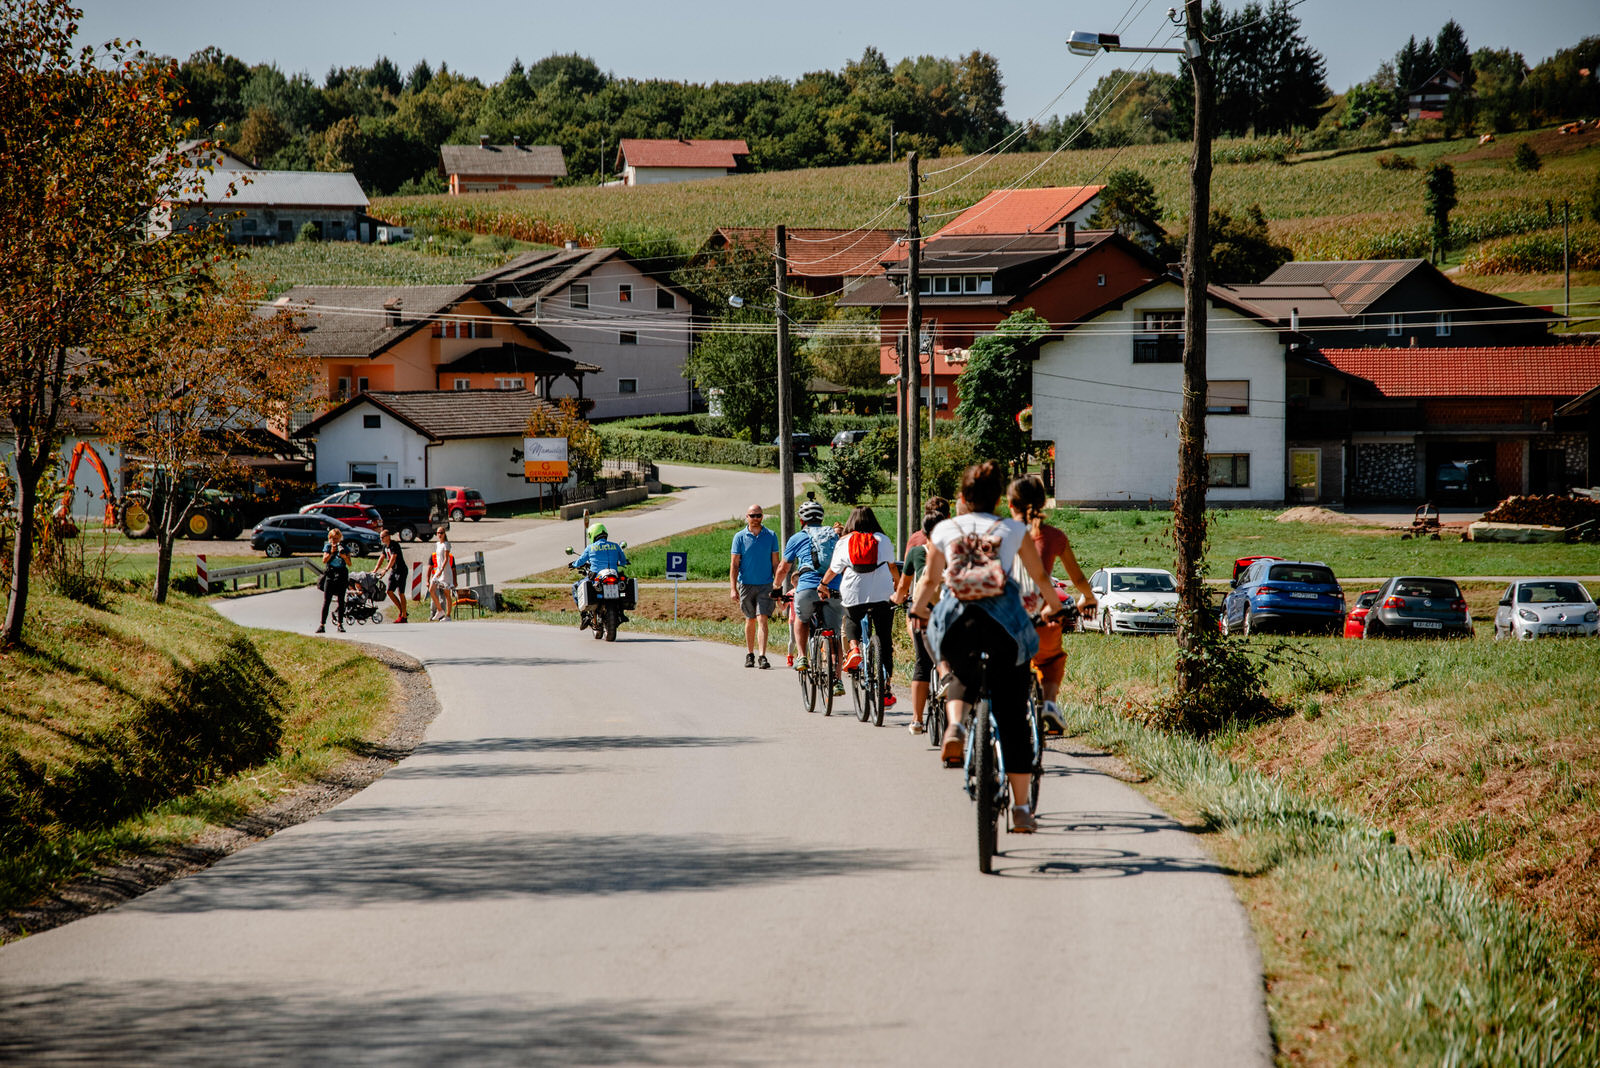 likaclub_jaškovo_štrudlafest 20205_9_2020 (41)